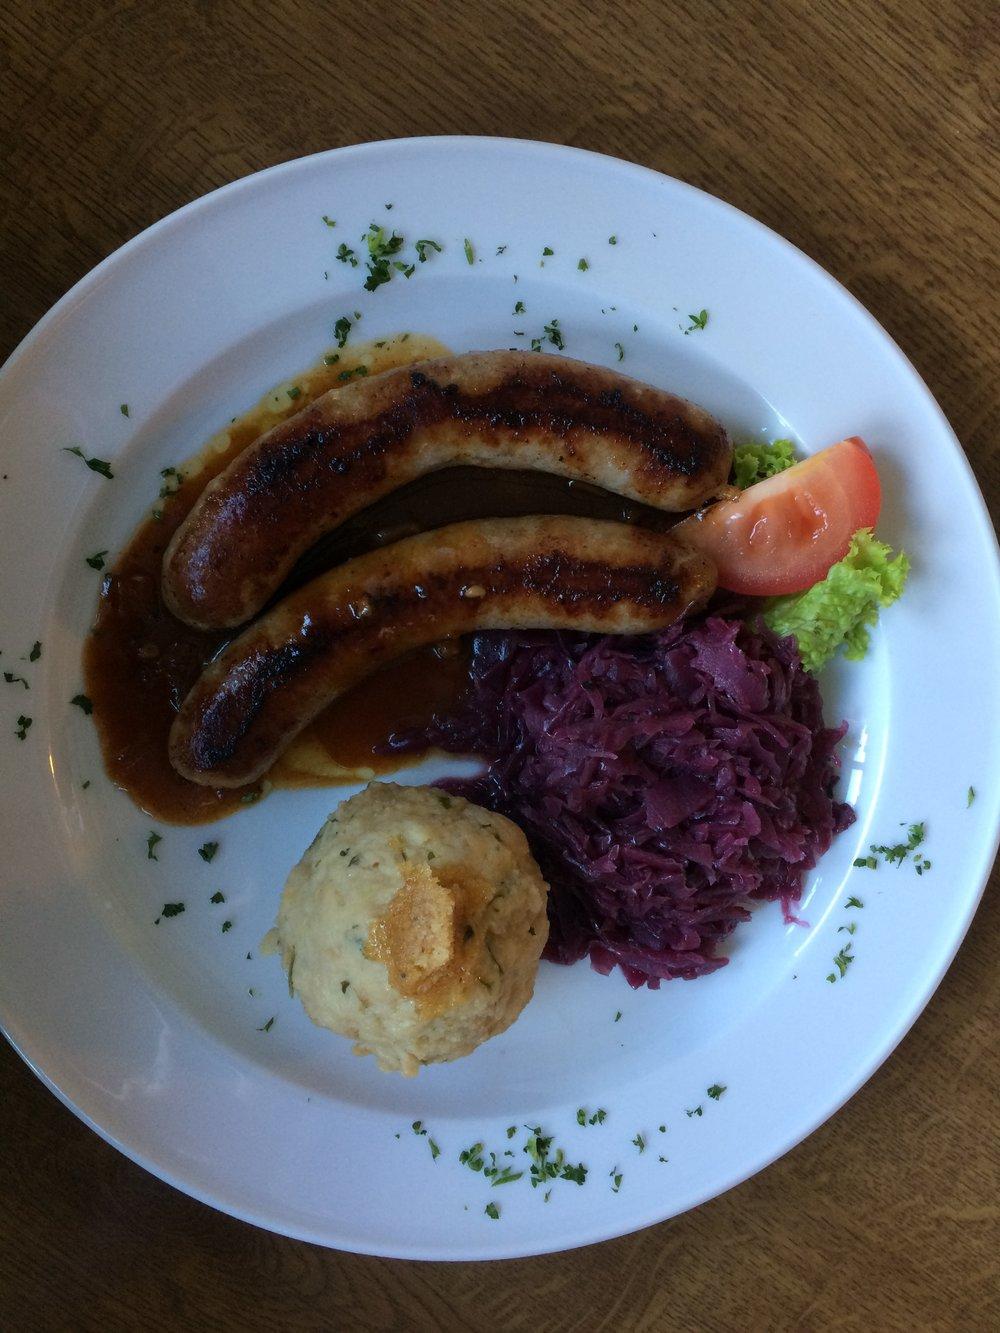 Brats & gravy, mashed potatoes, red kraut...mmmmmmm